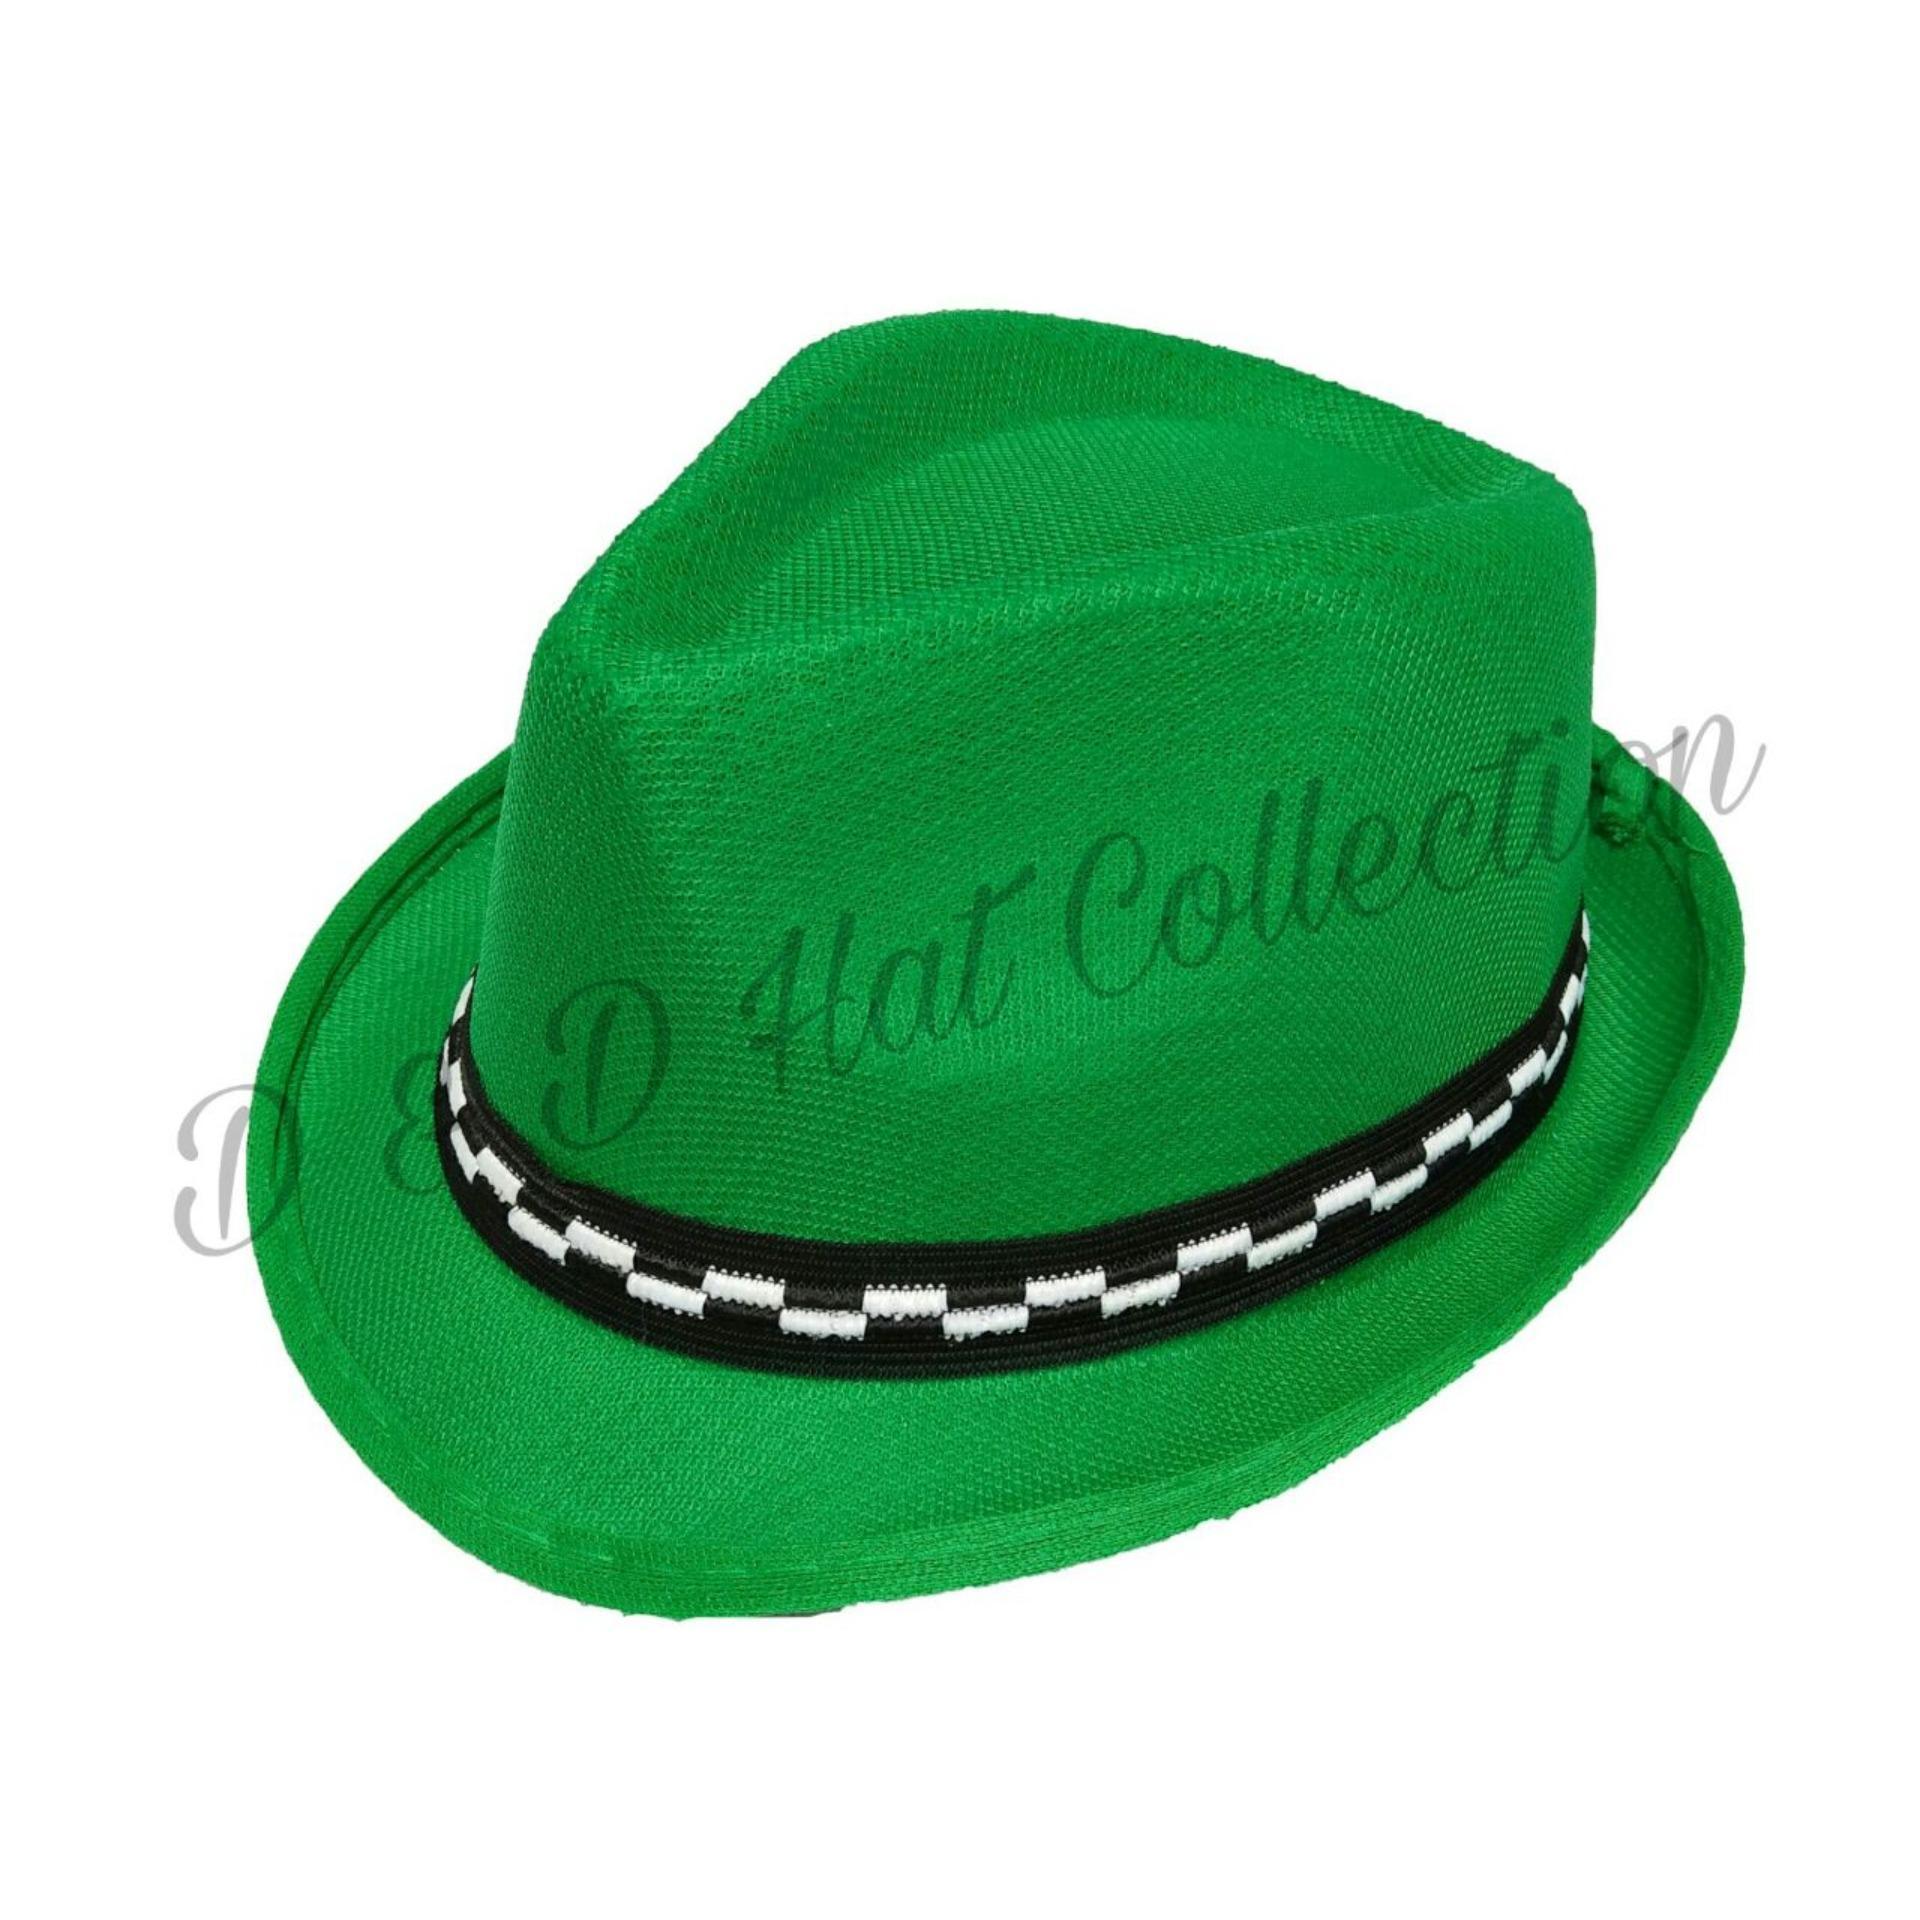 Pencarian Termurah D   D Fashion Fedora Hat For Kids   Topi Fedora Jazz  Anak Unisex 1470829f0b